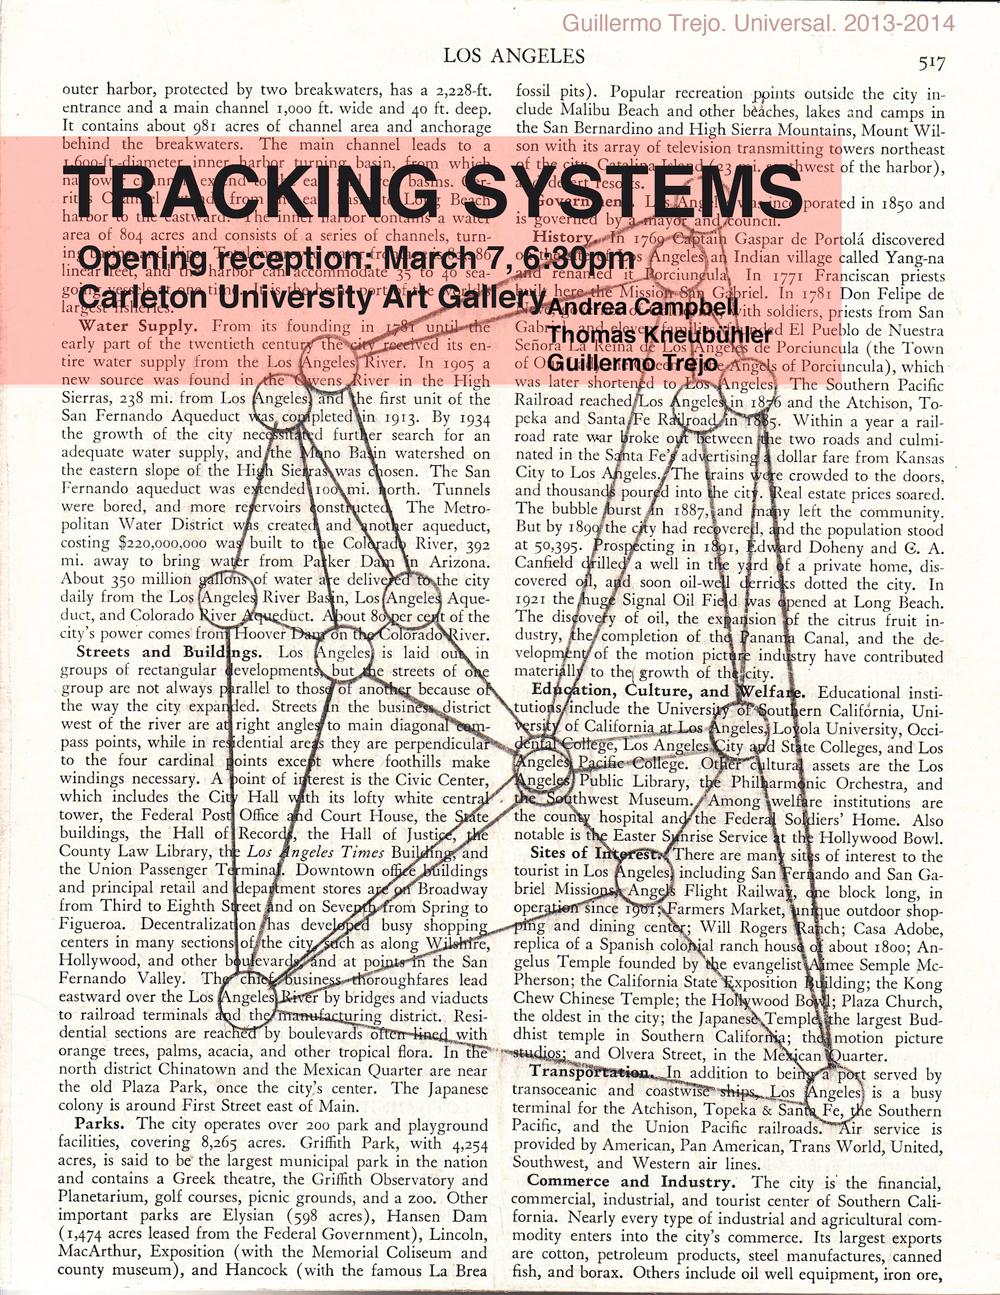 TrackingSystemsInvite.jpg